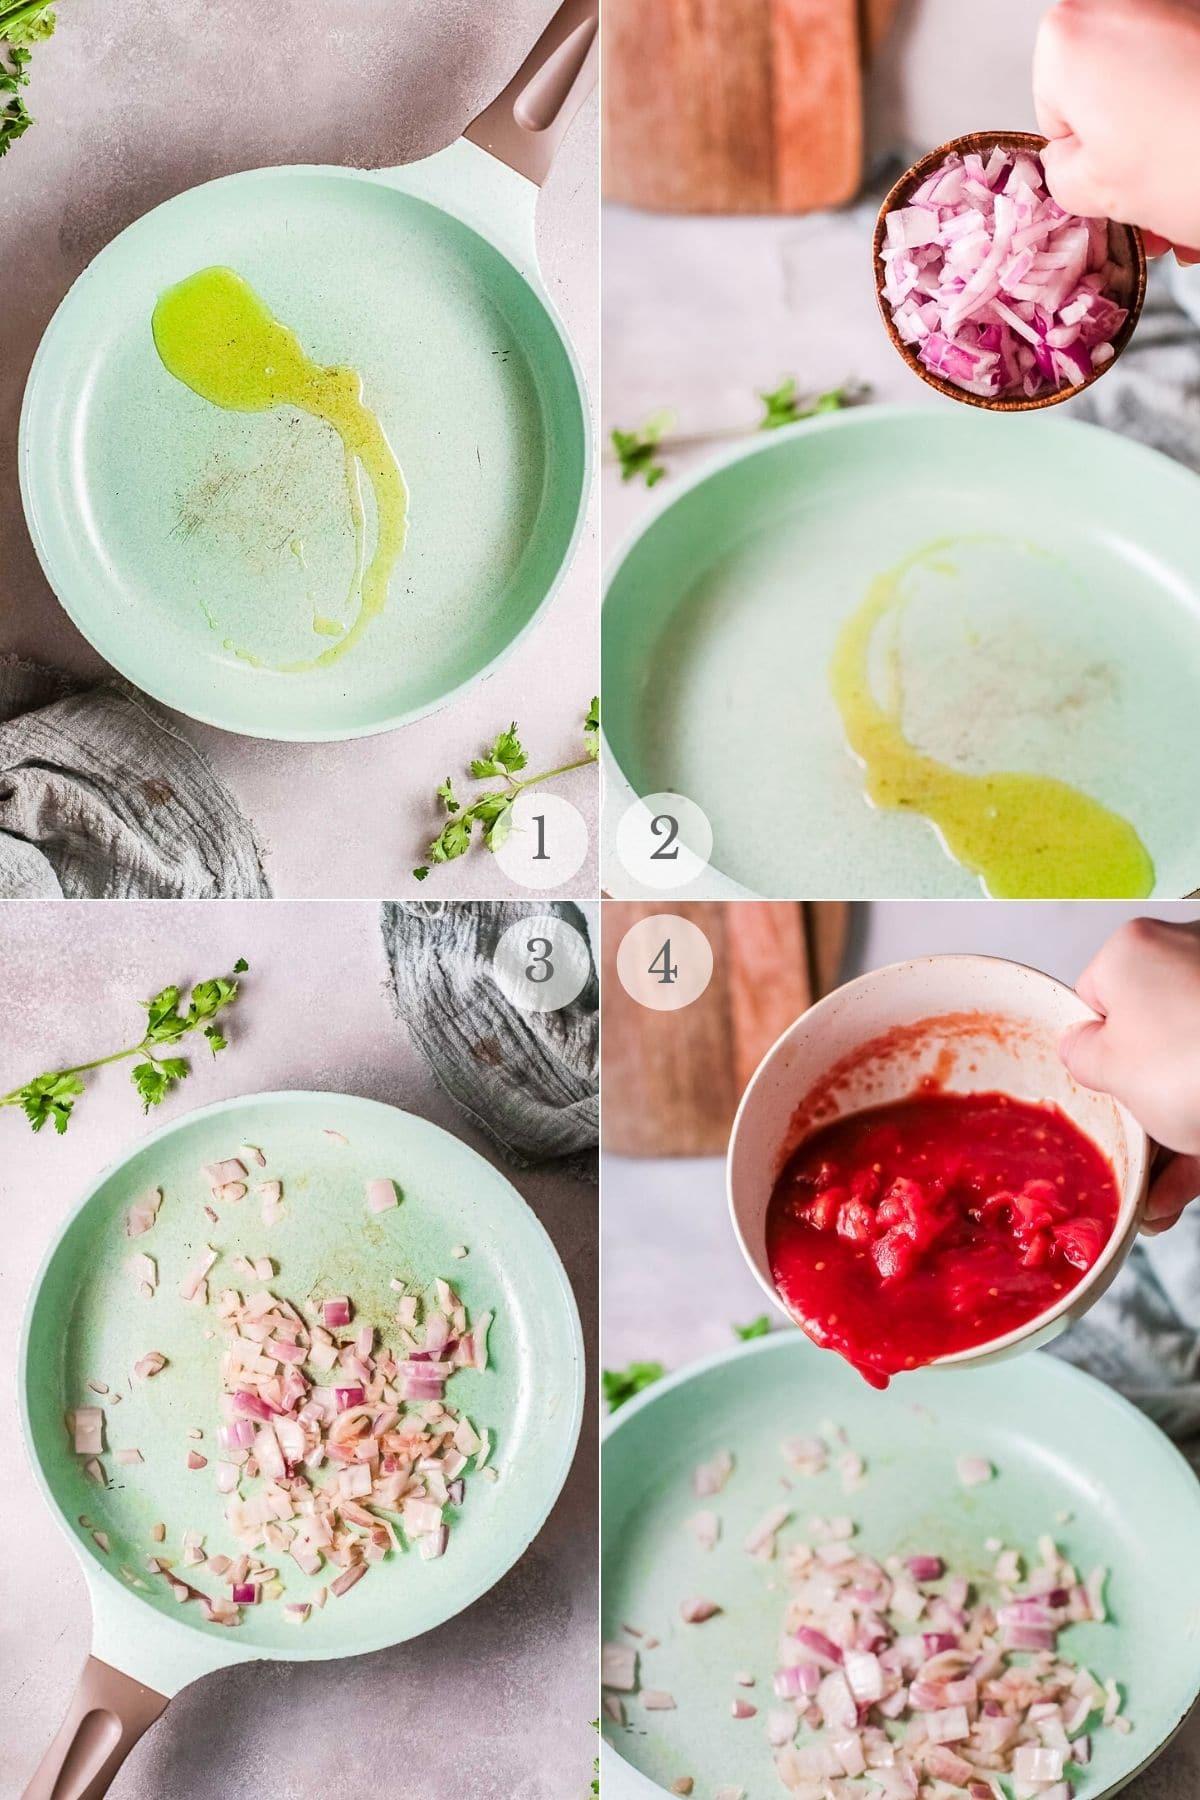 chana masala recipe steps 1-4